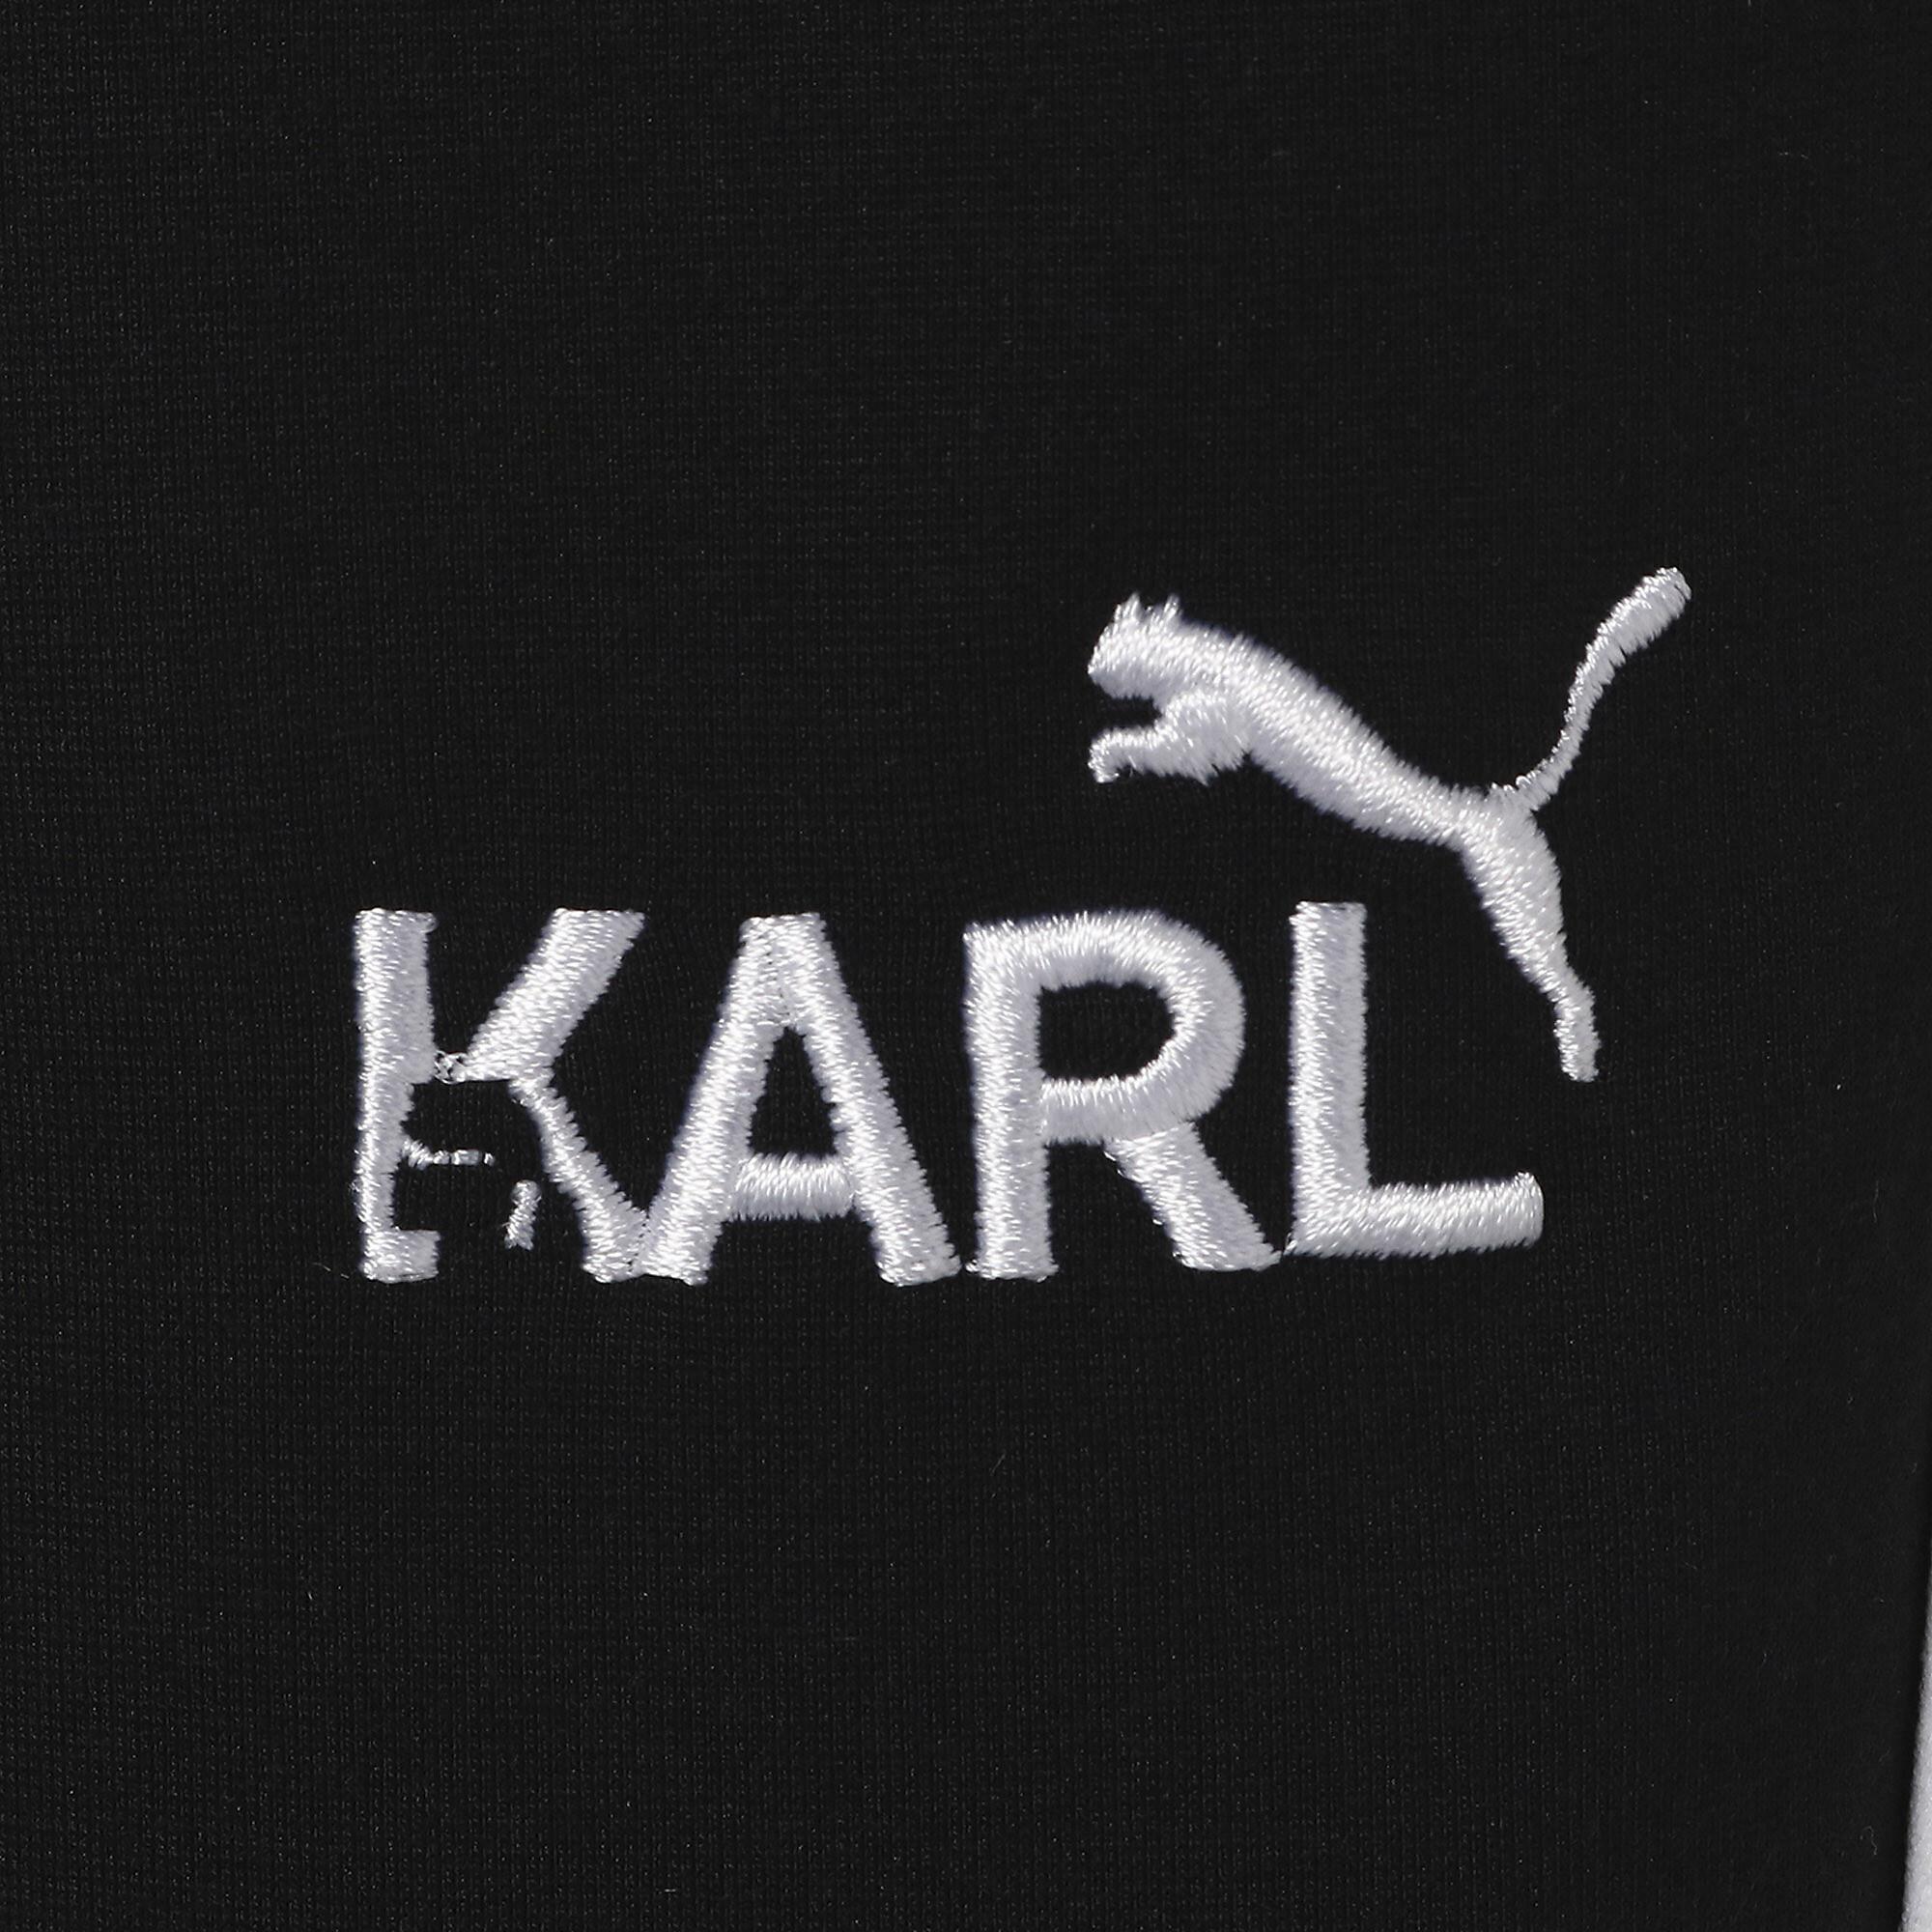 Image Puma PUMA x KARL LAGERFELD Men's Track Pants #6